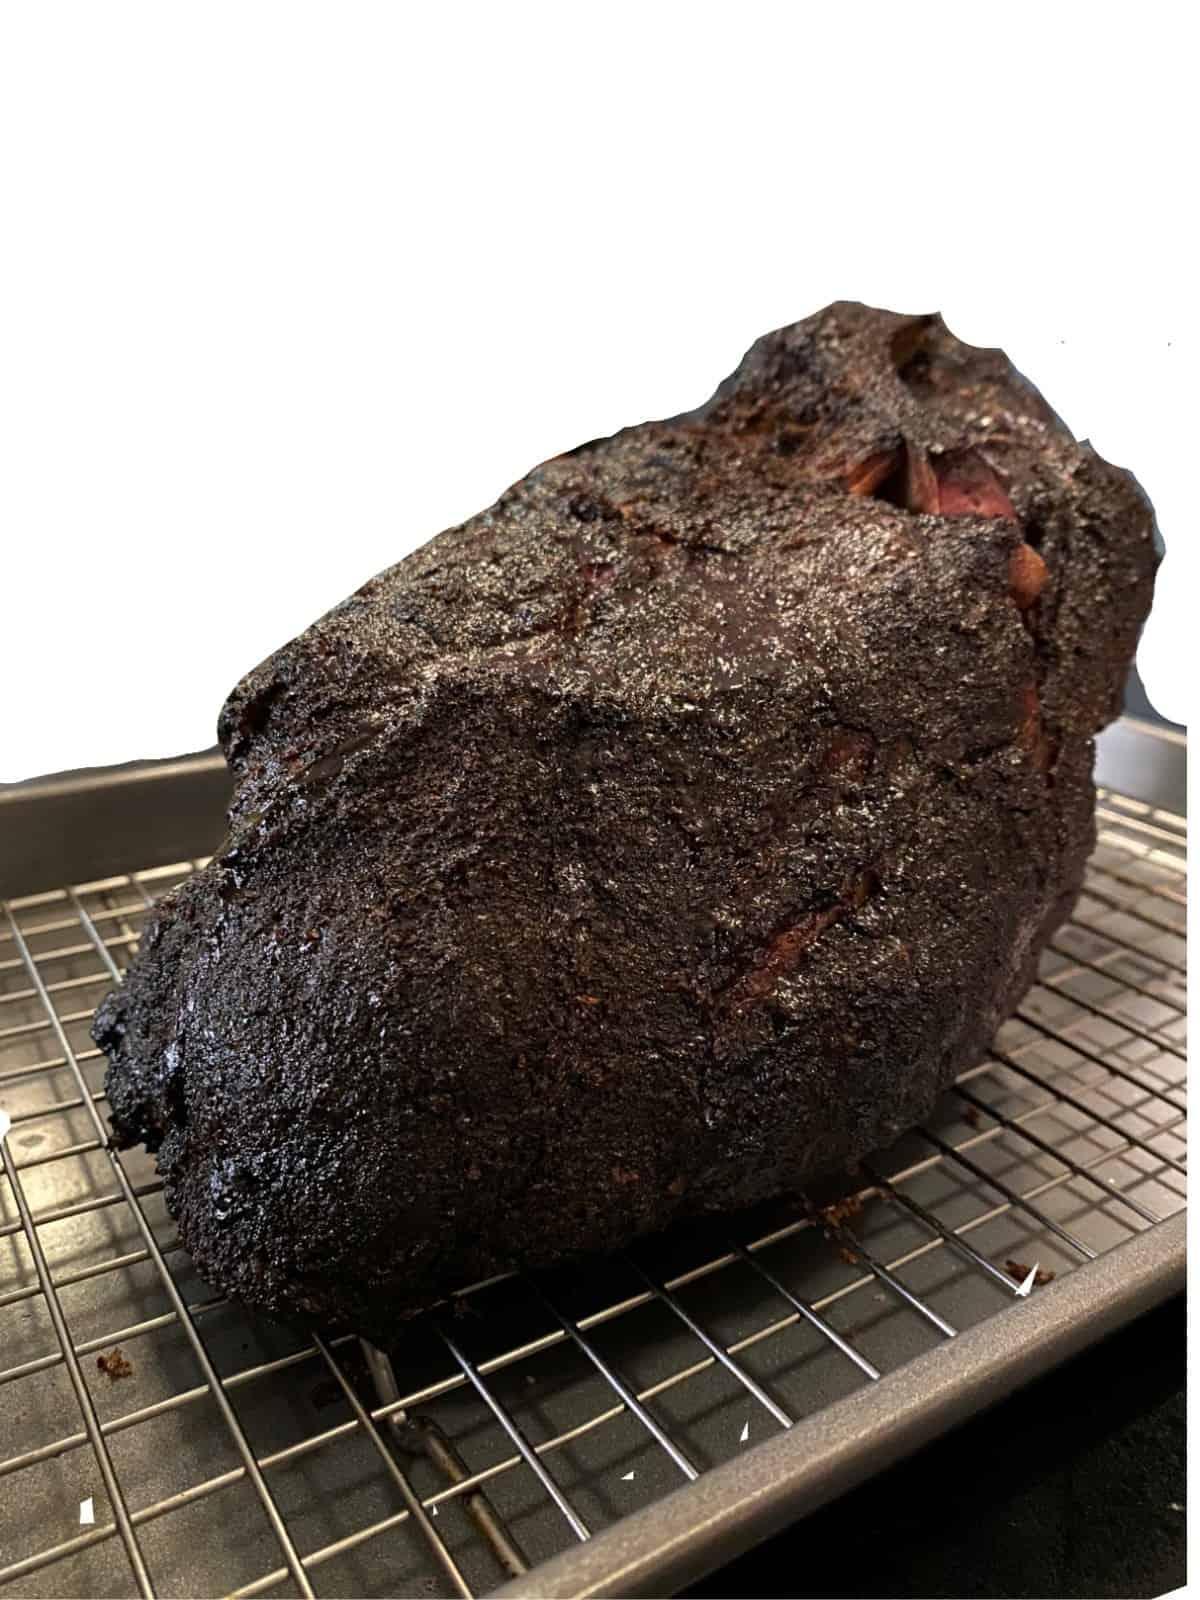 smoked pork butt resting